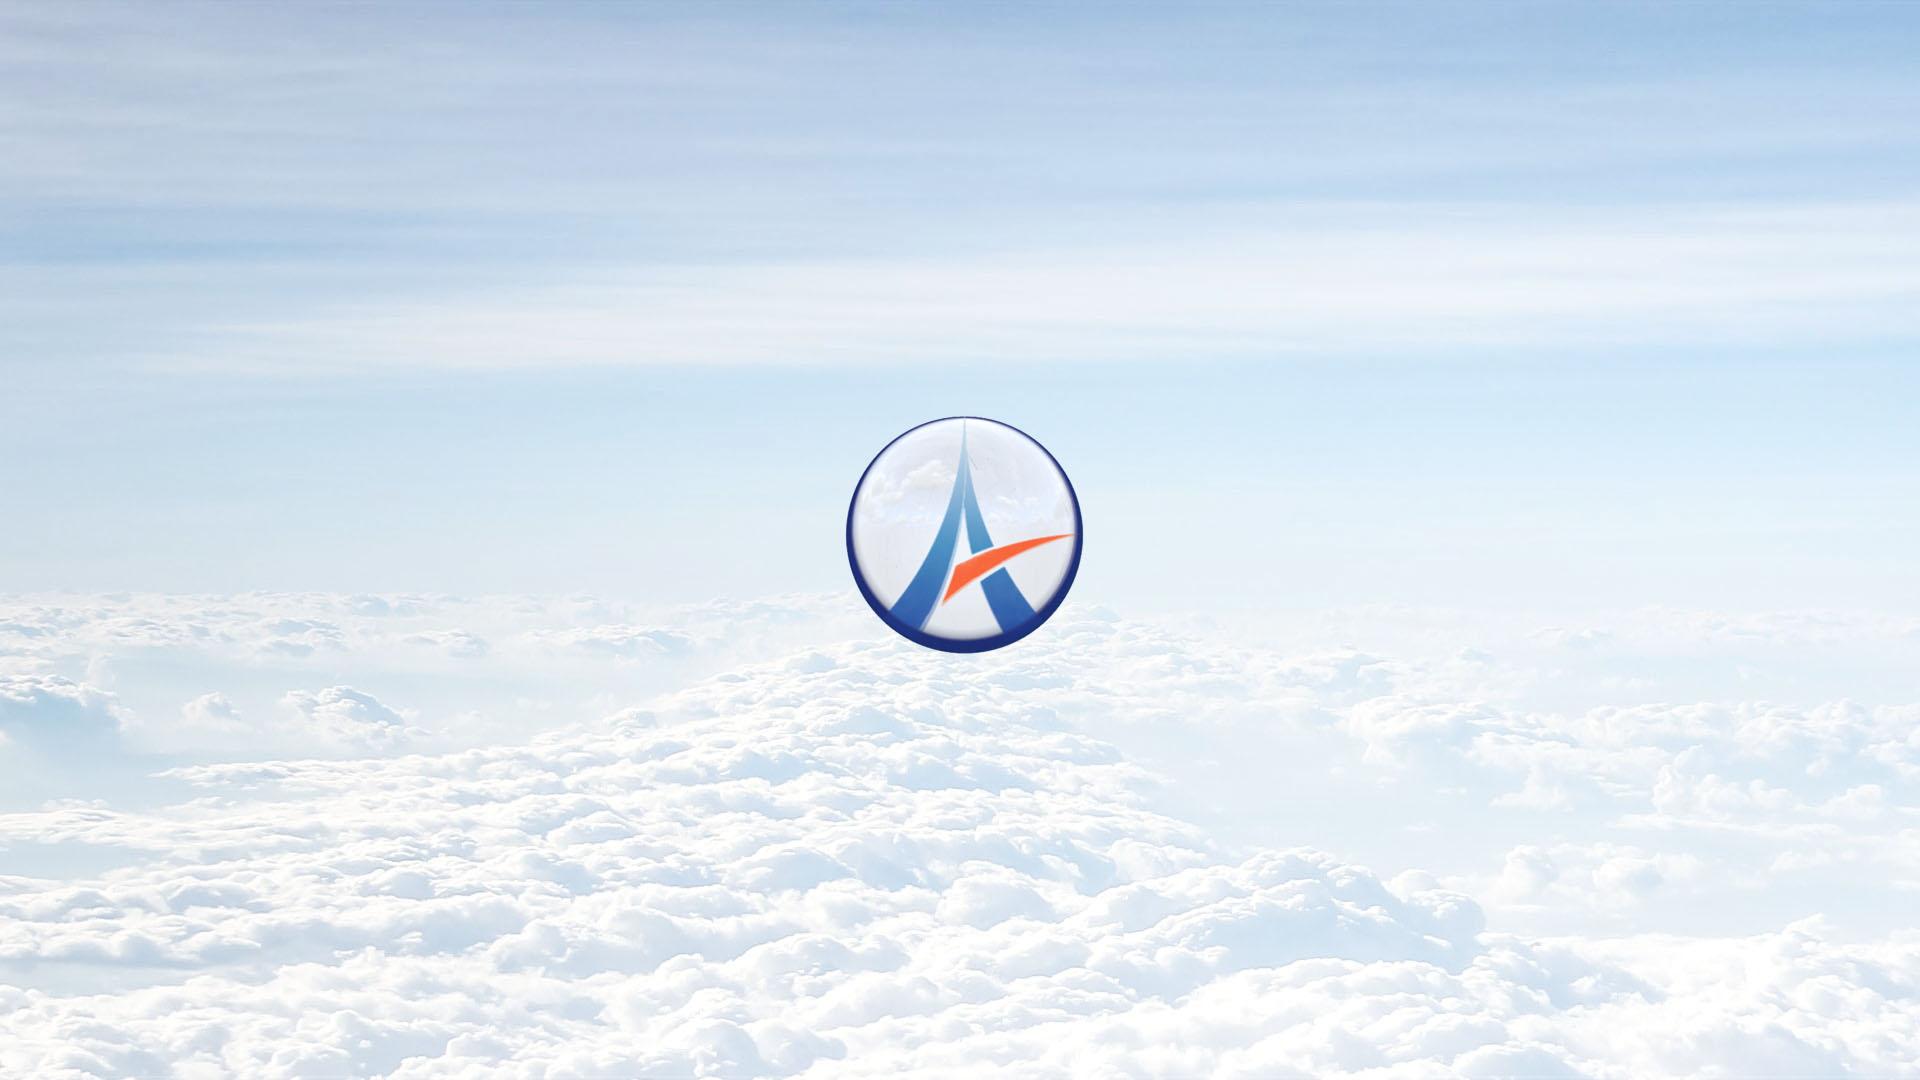 Ascendant Studio logo over clouds